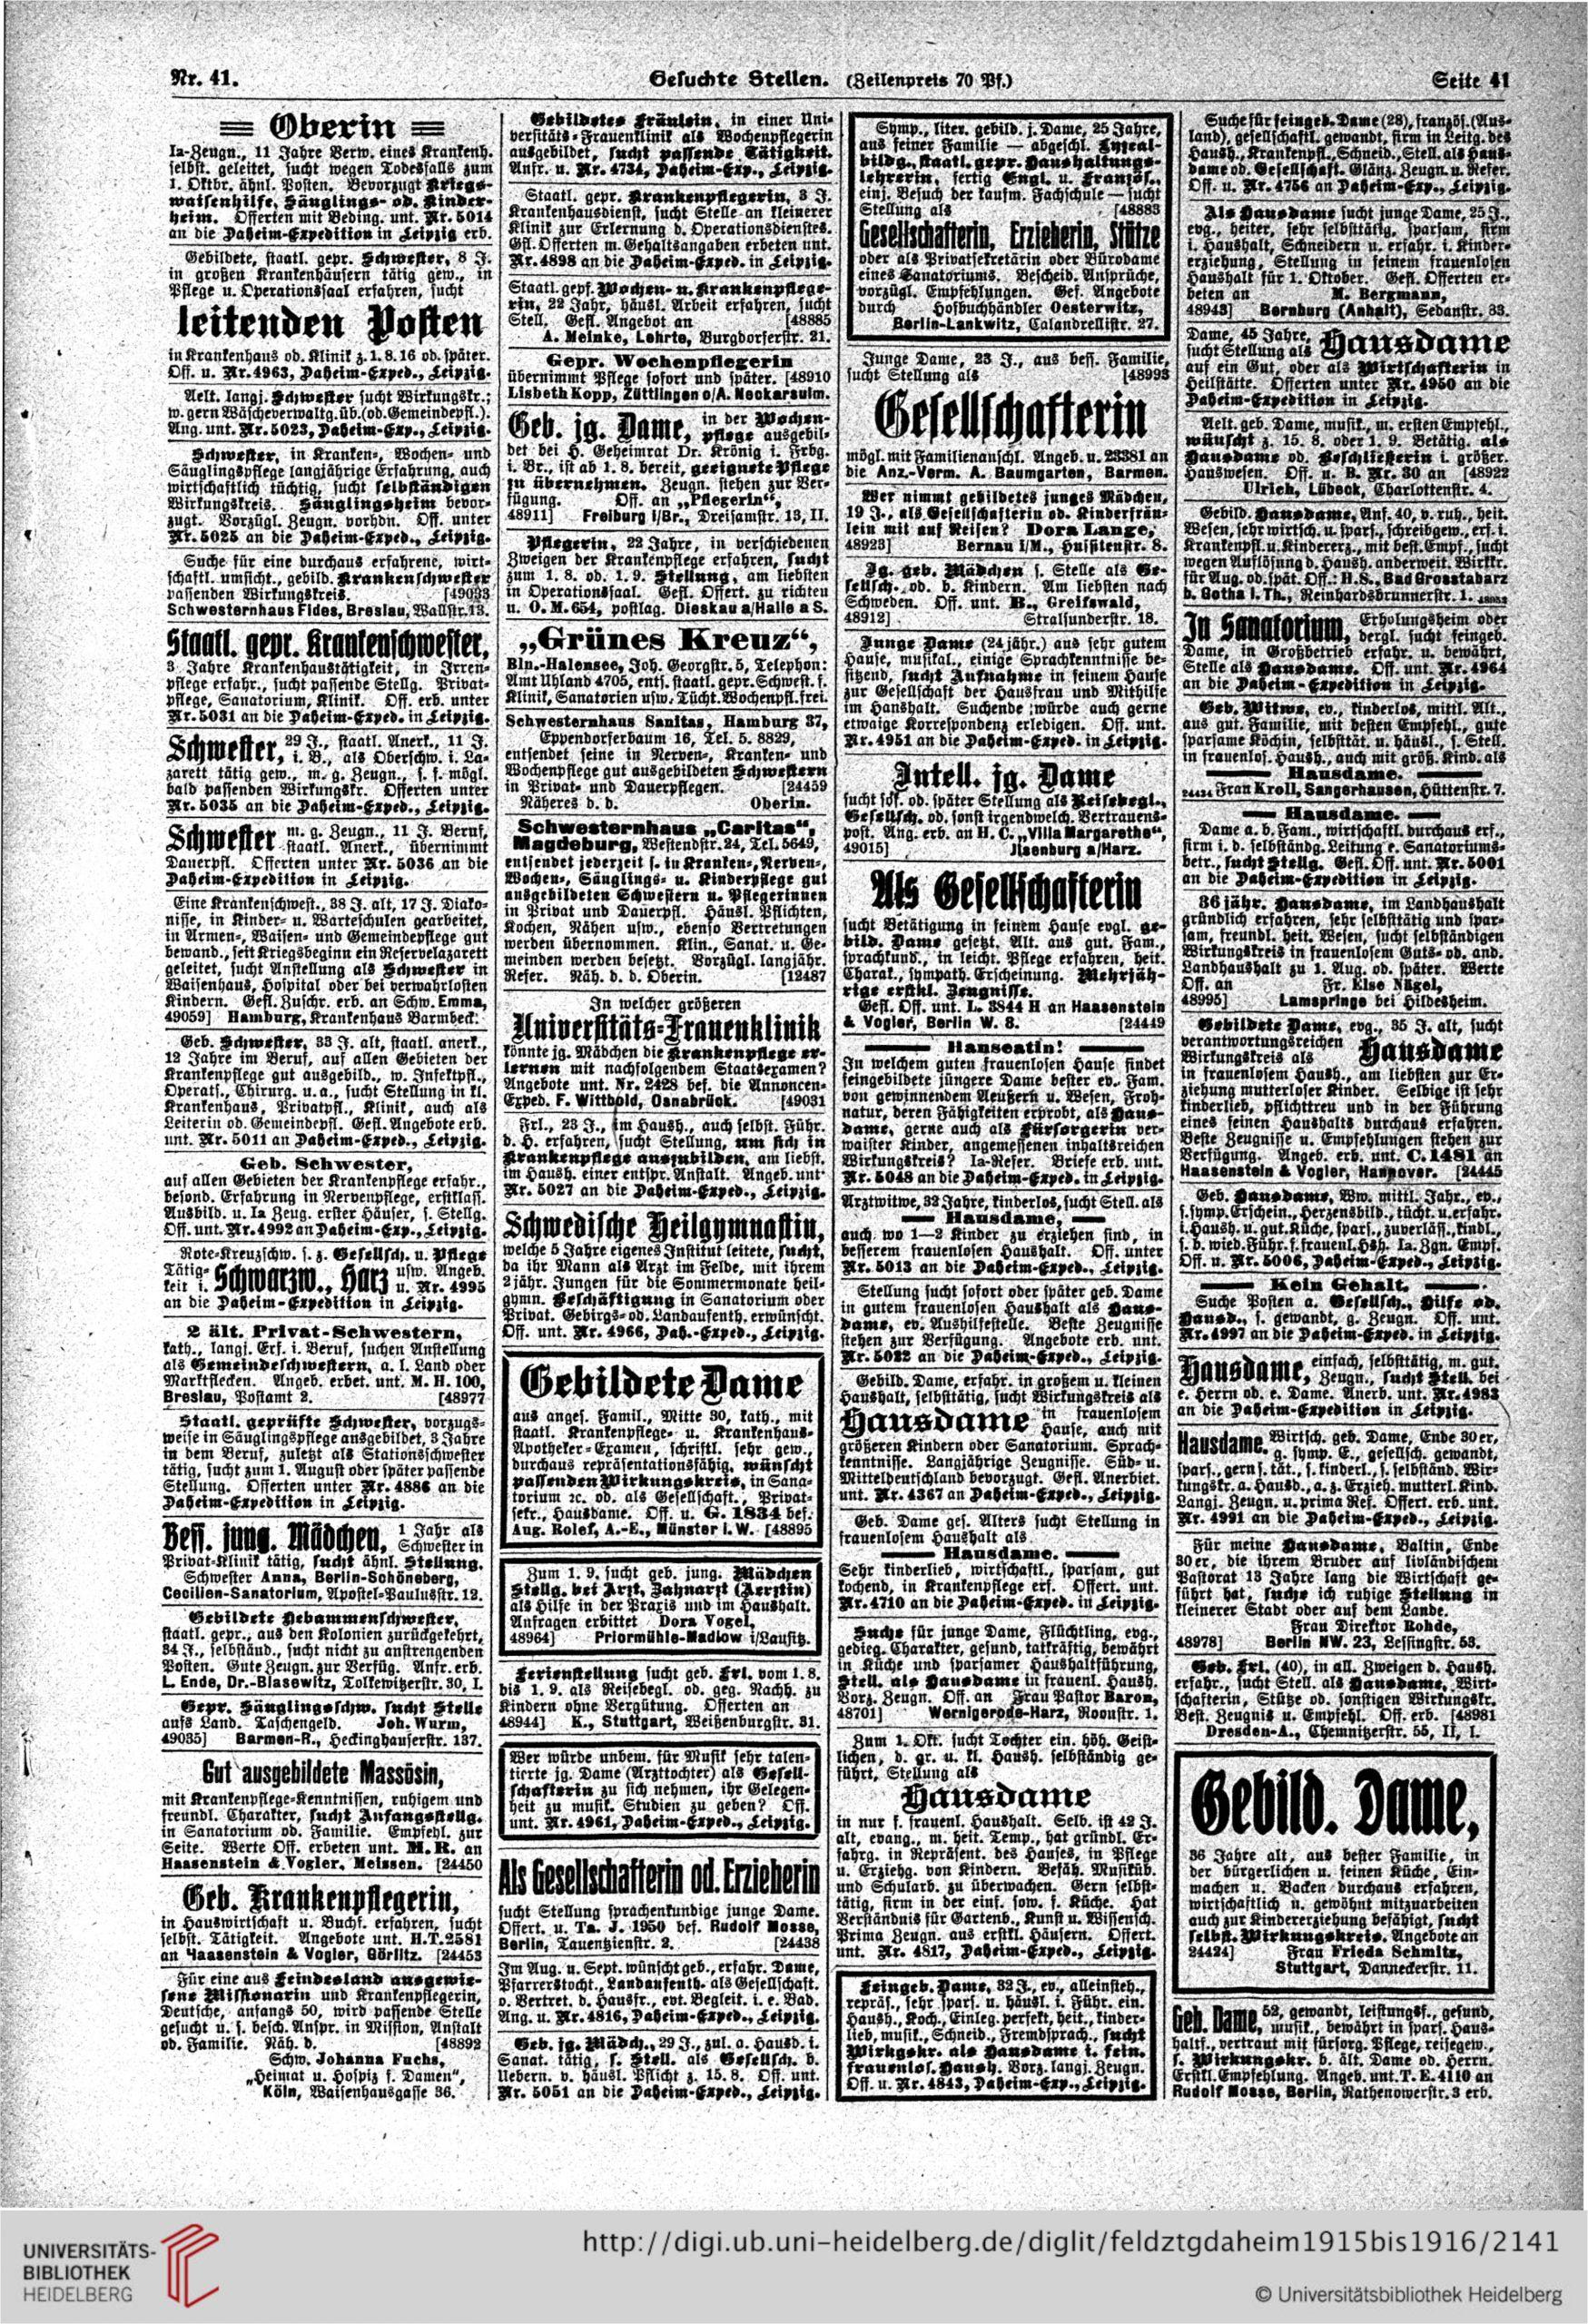 Eid No for Pan Card Daheim 52 1915 1916